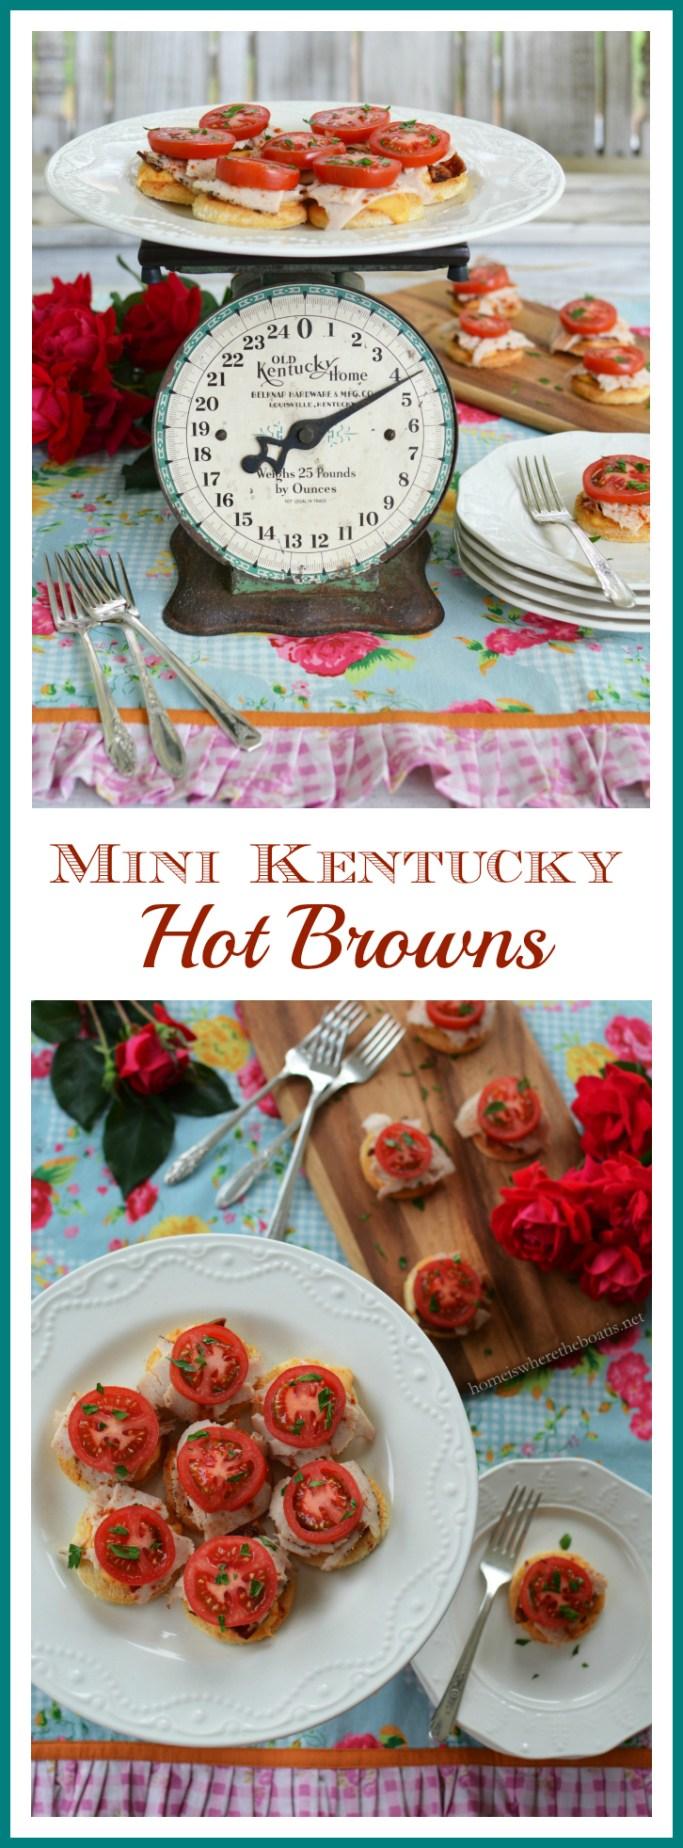 Mini Hot Browns